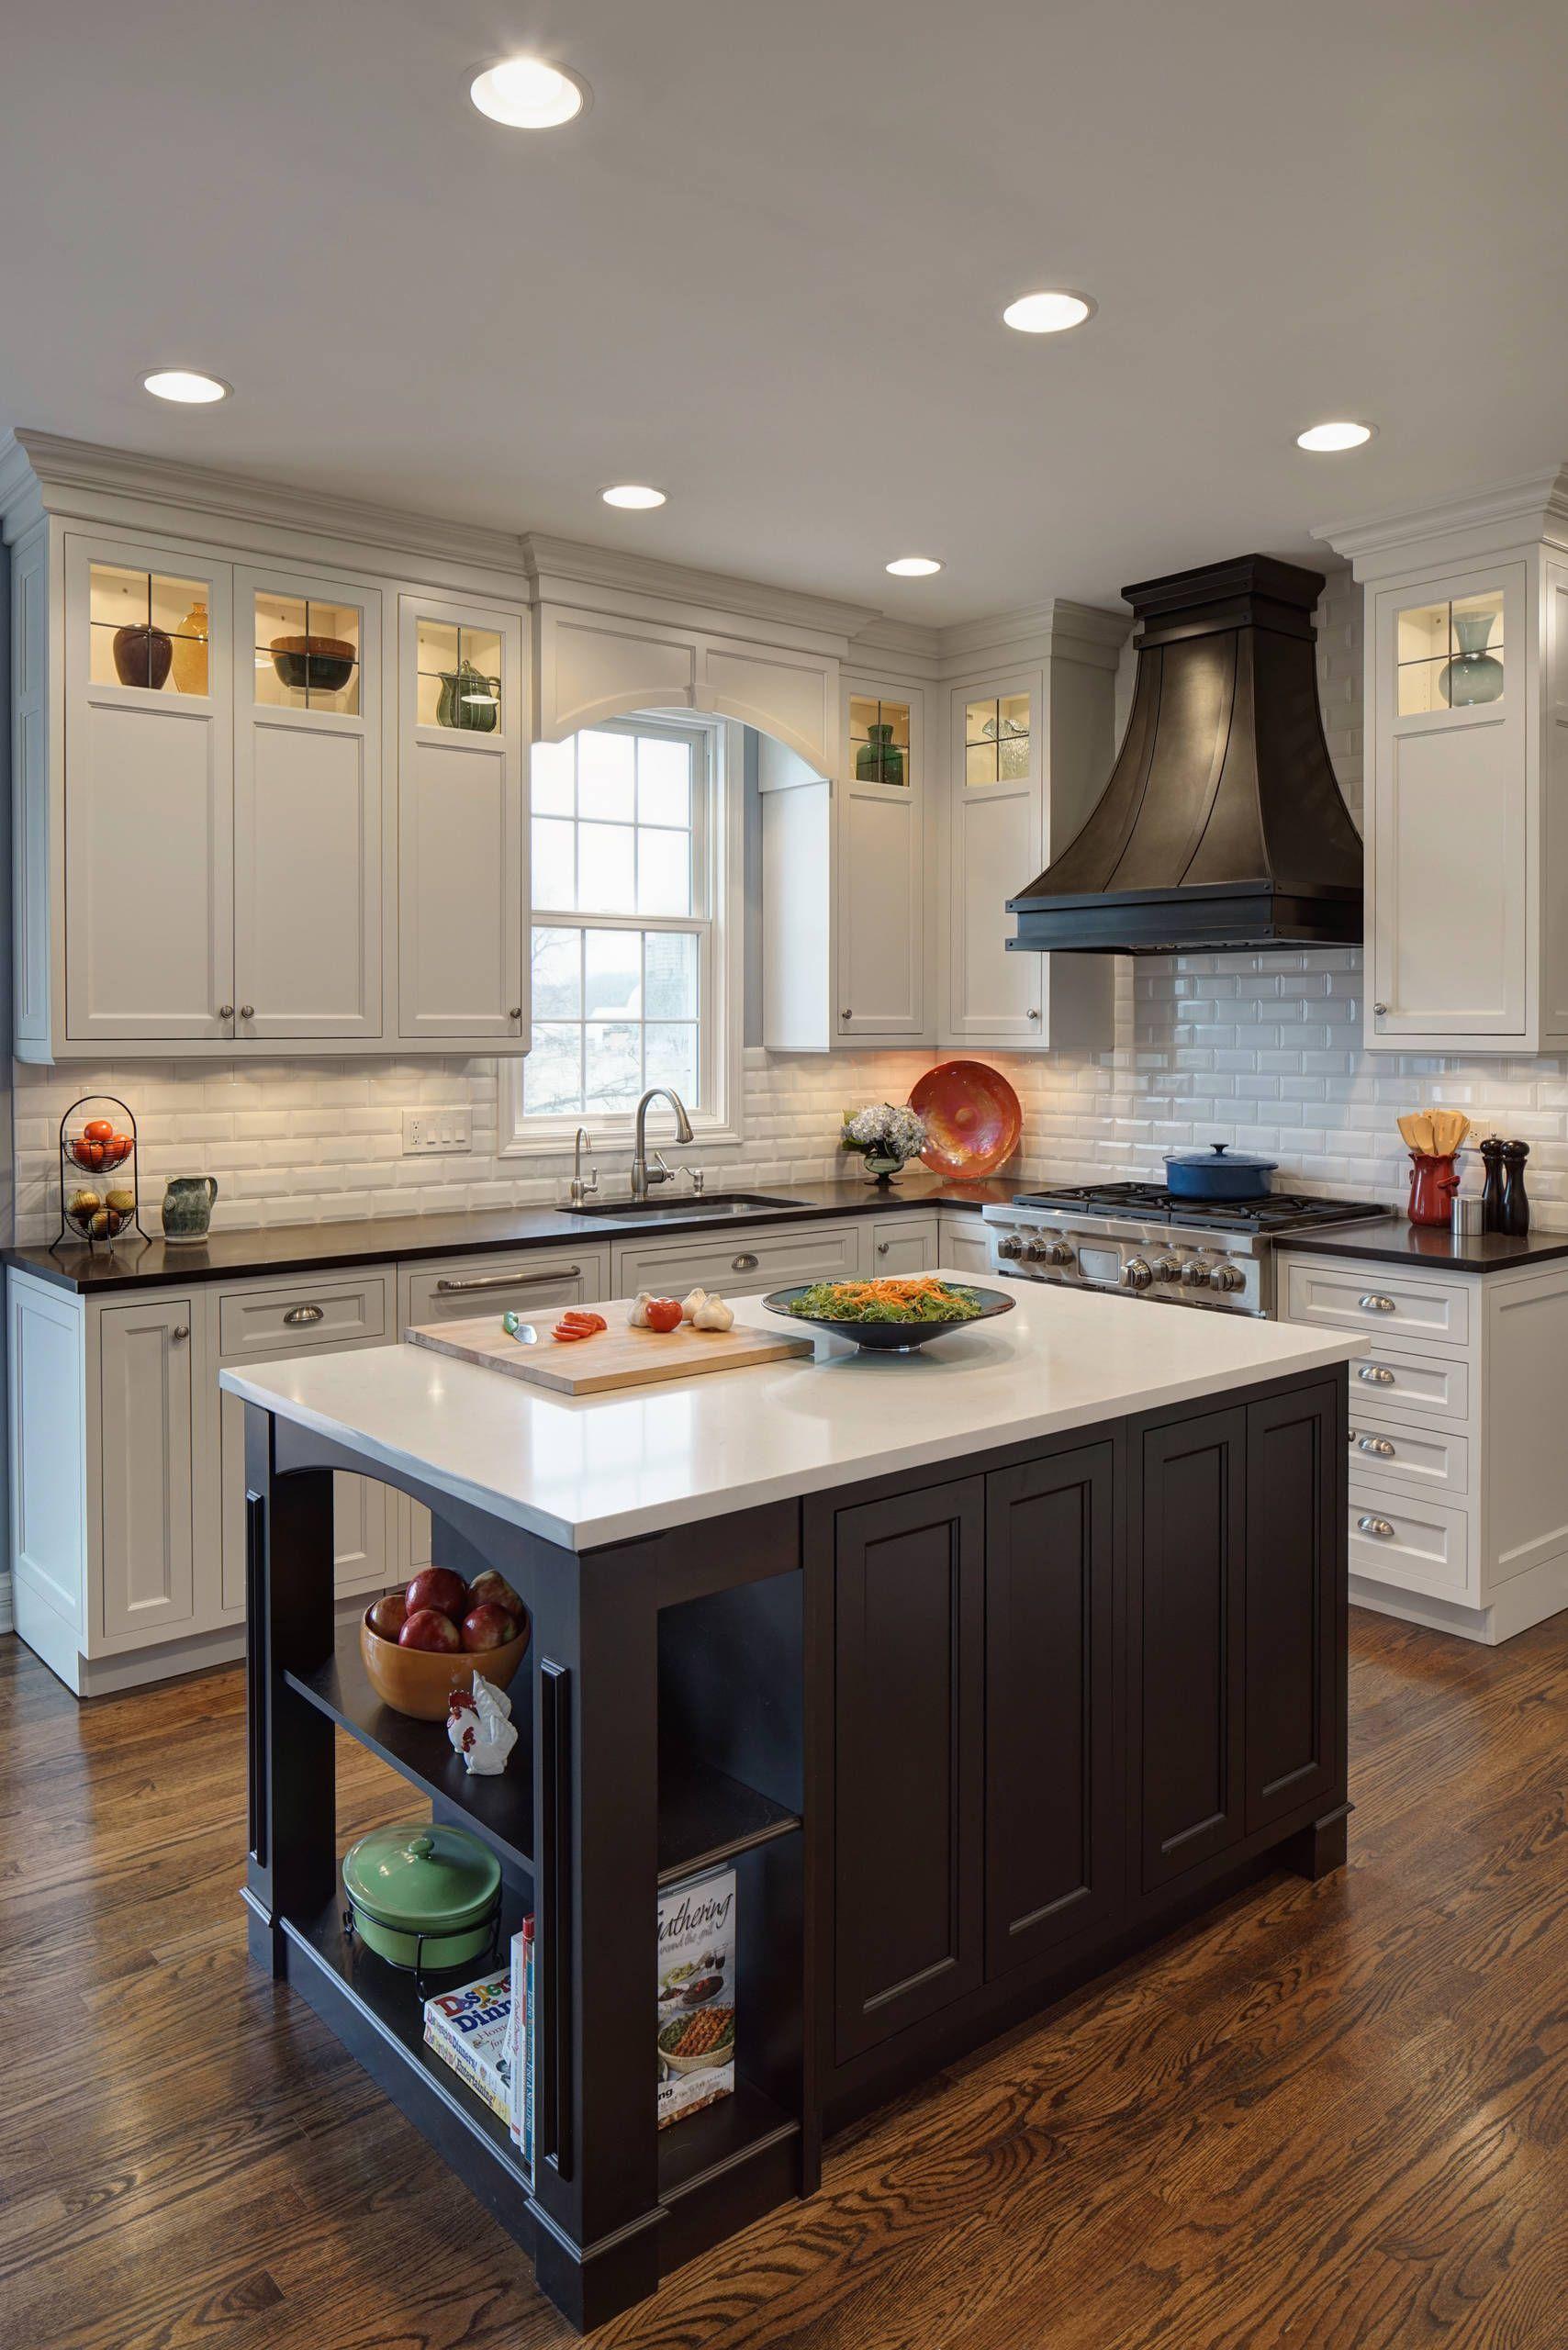 42 Drop-Dead Gorgeous Traditional Kitchen Ideas | ✪ Home Decoration